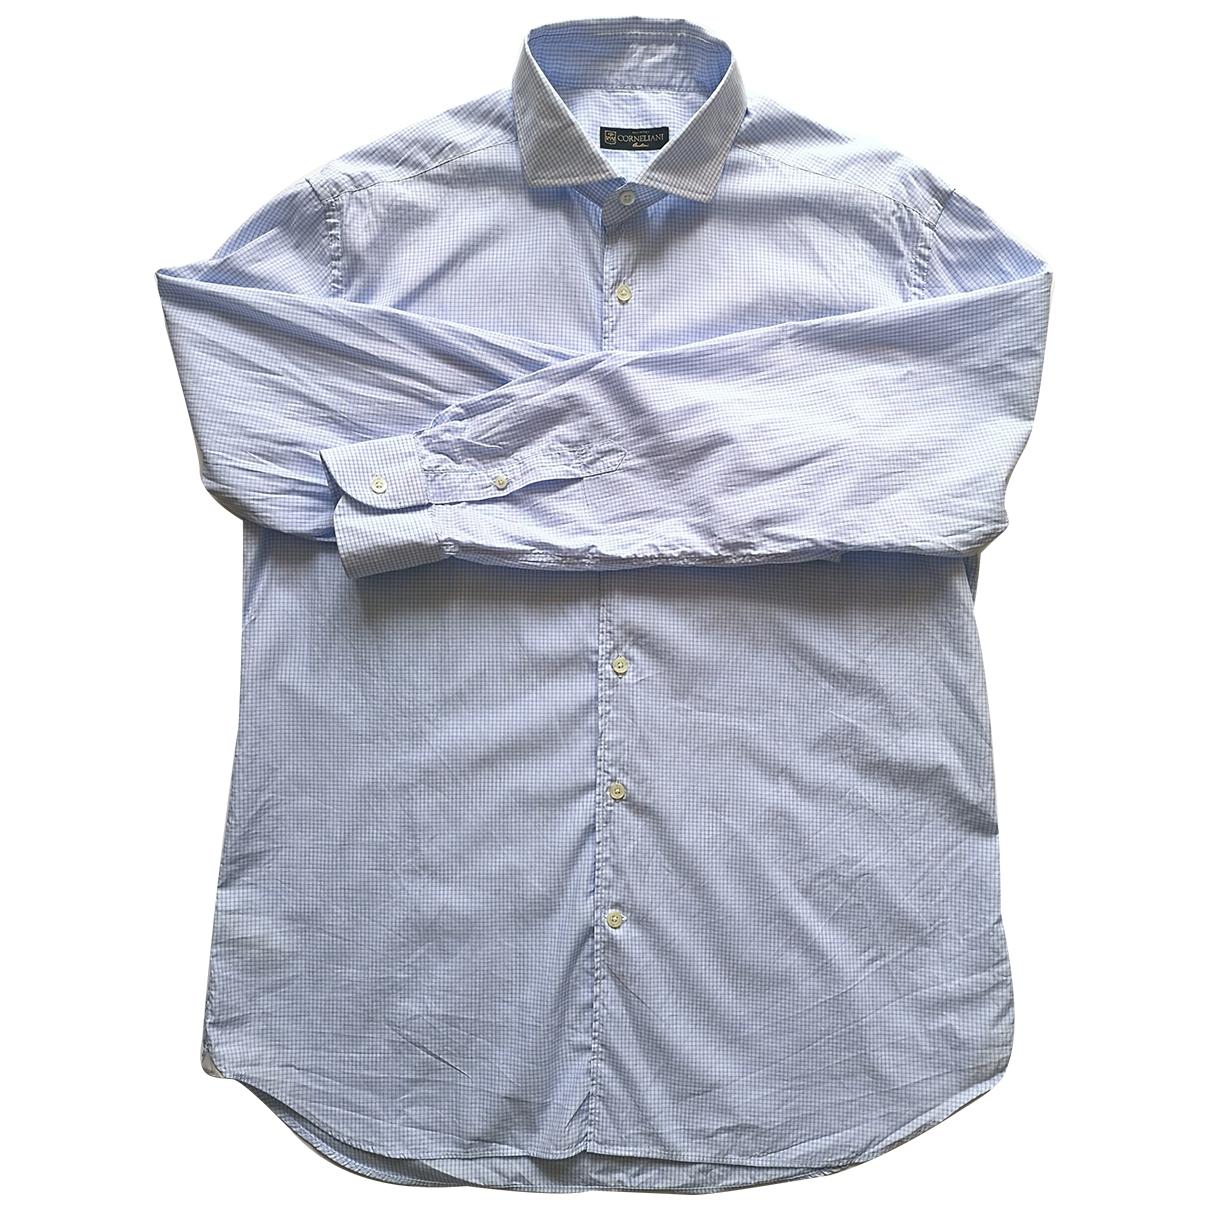 Corneliani \N Blue Cotton Shirts for Men 17 UK - US (tour de cou / collar)